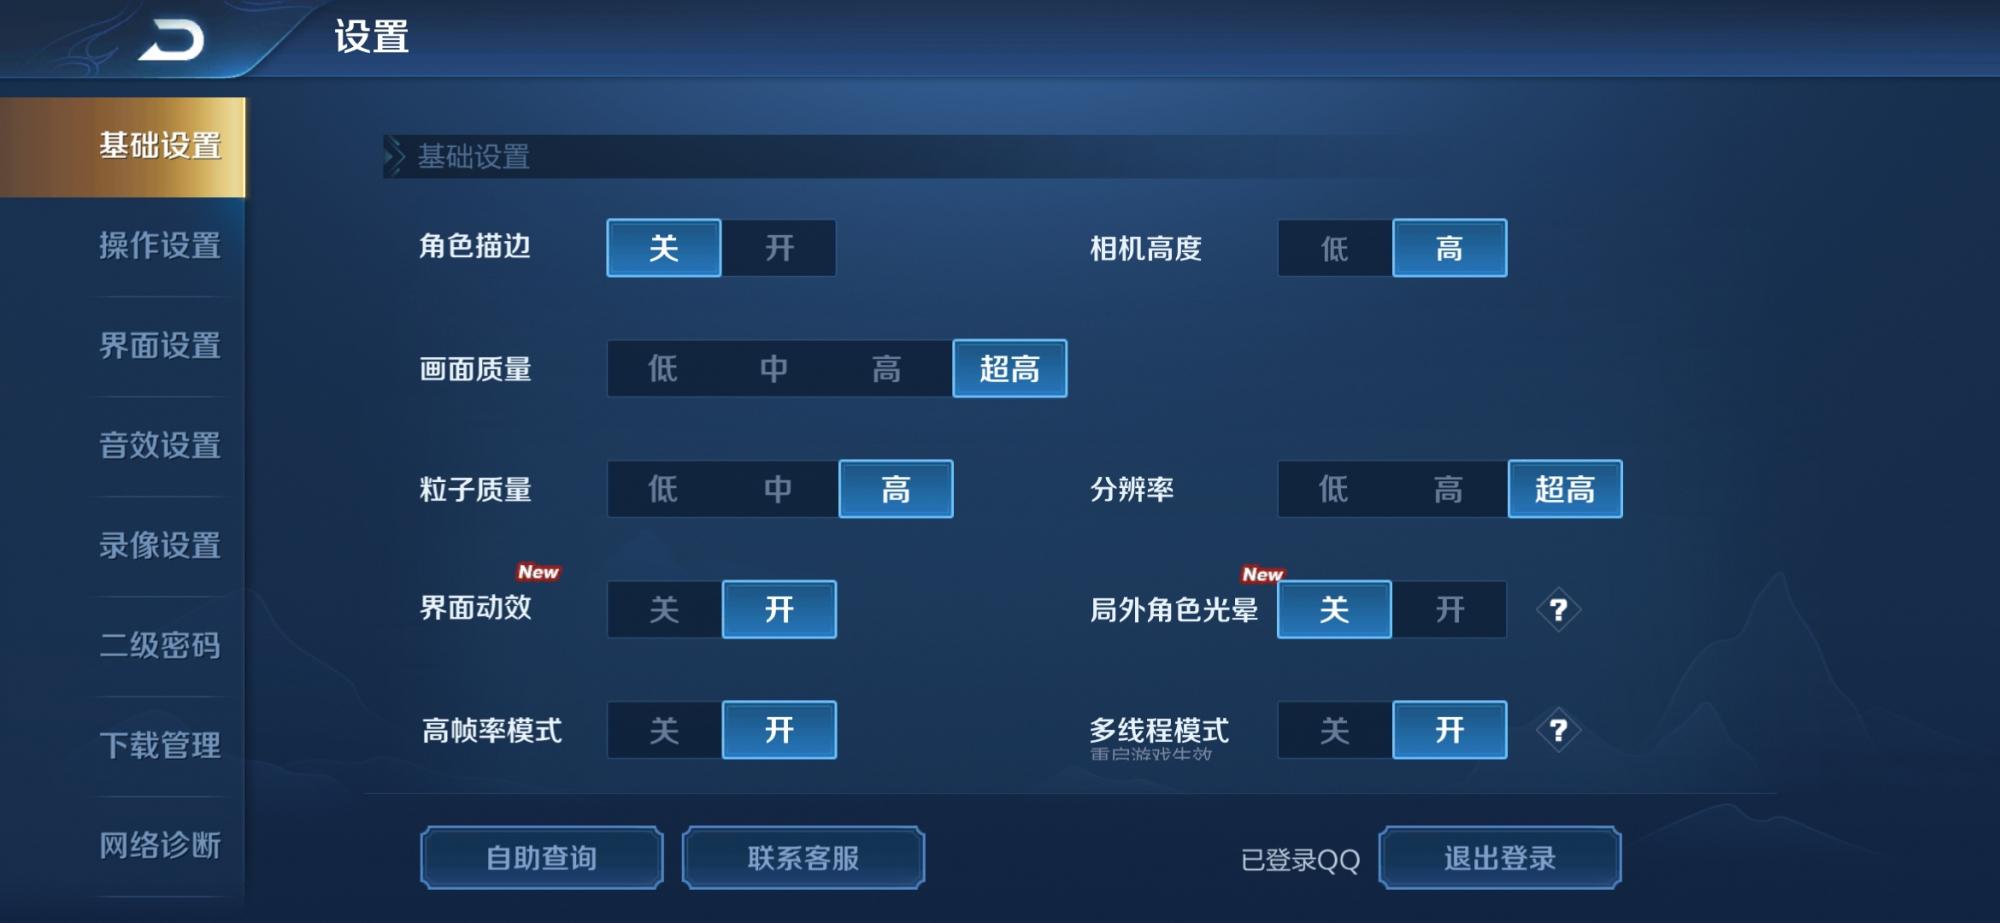 Screenshot_20190524_211104_com.tencent.tmgp.sgame.jpg